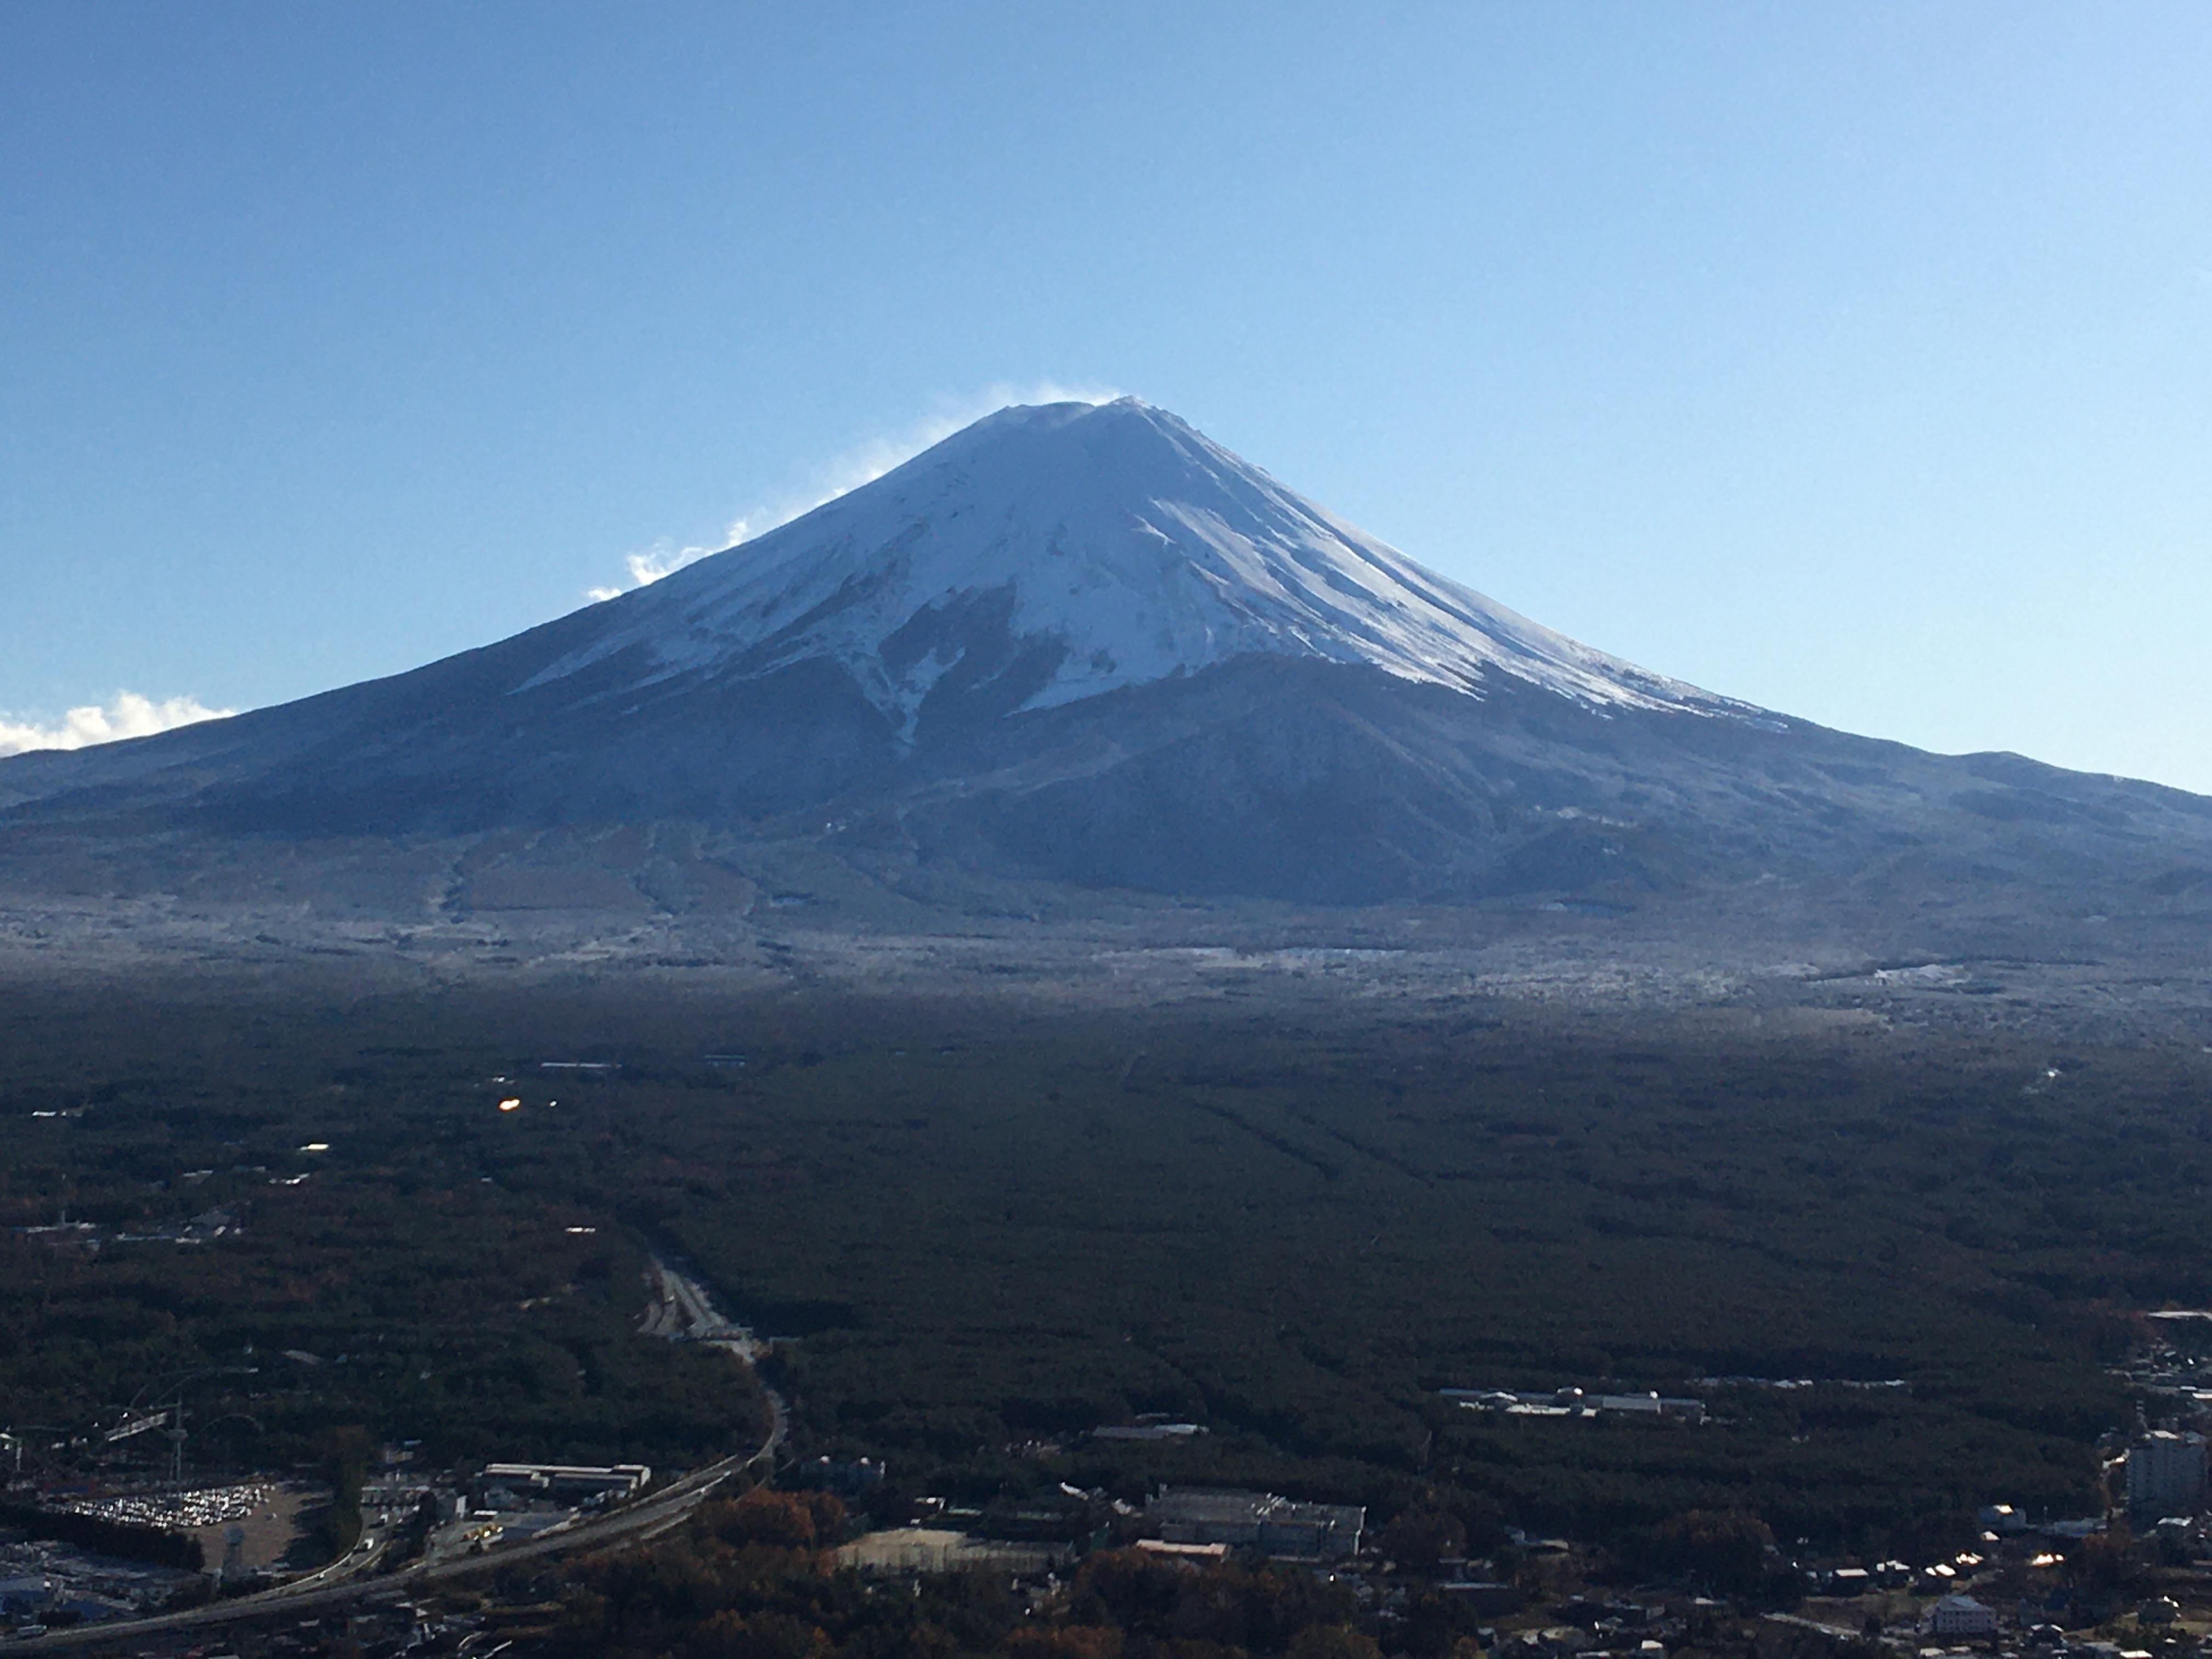 Mt.Fuji from the top station of Mt. Kachikachi ropeway